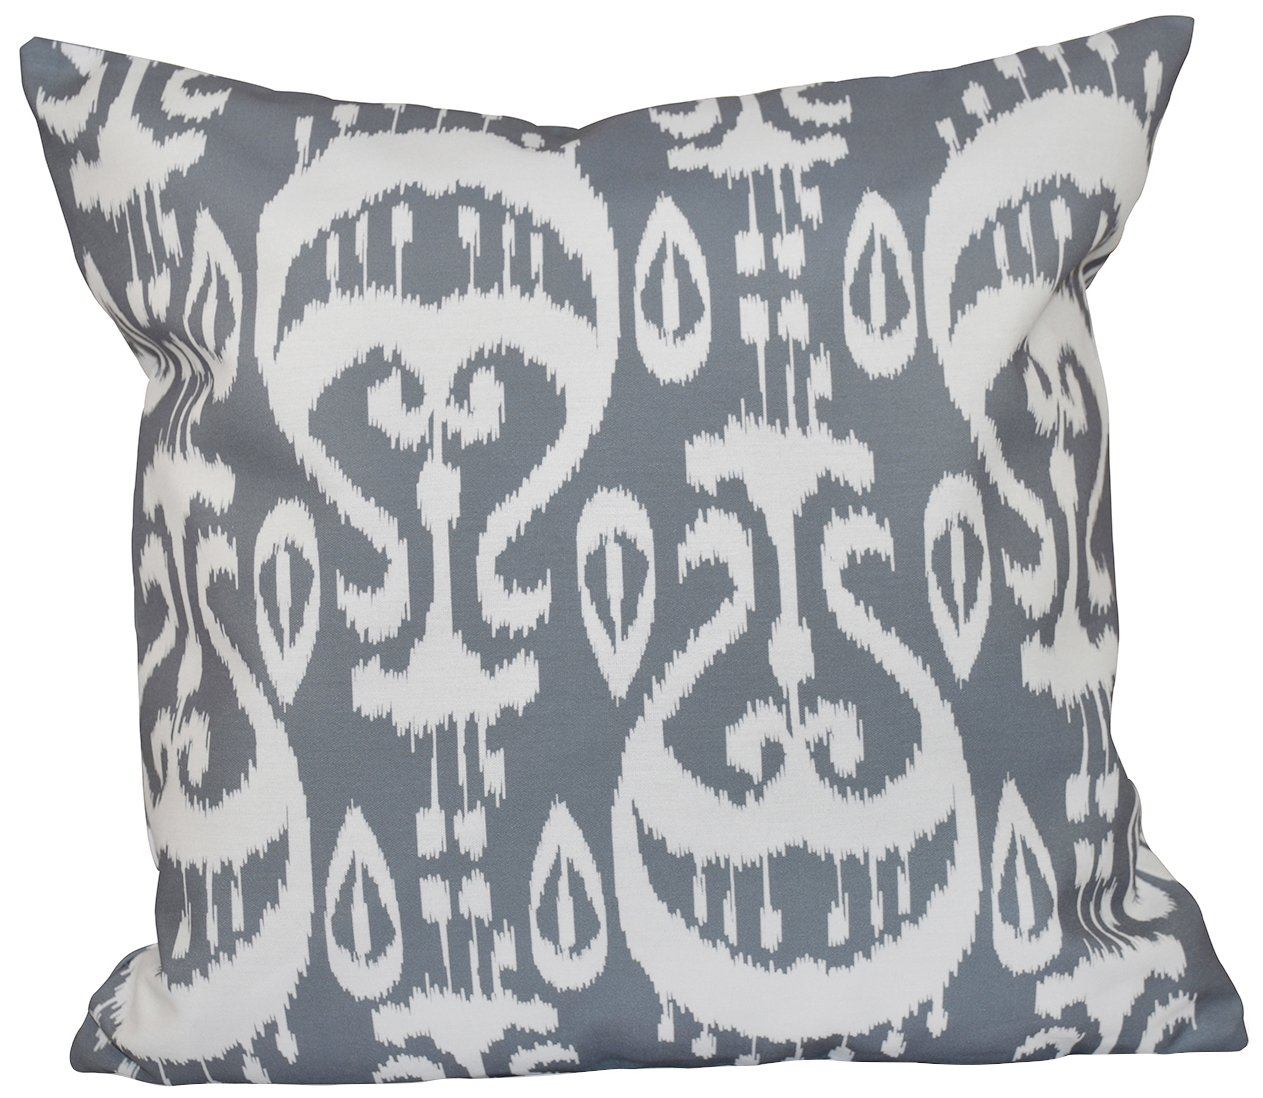 E by design O5PGN544GY2-18 Printed Outdoor Pillow